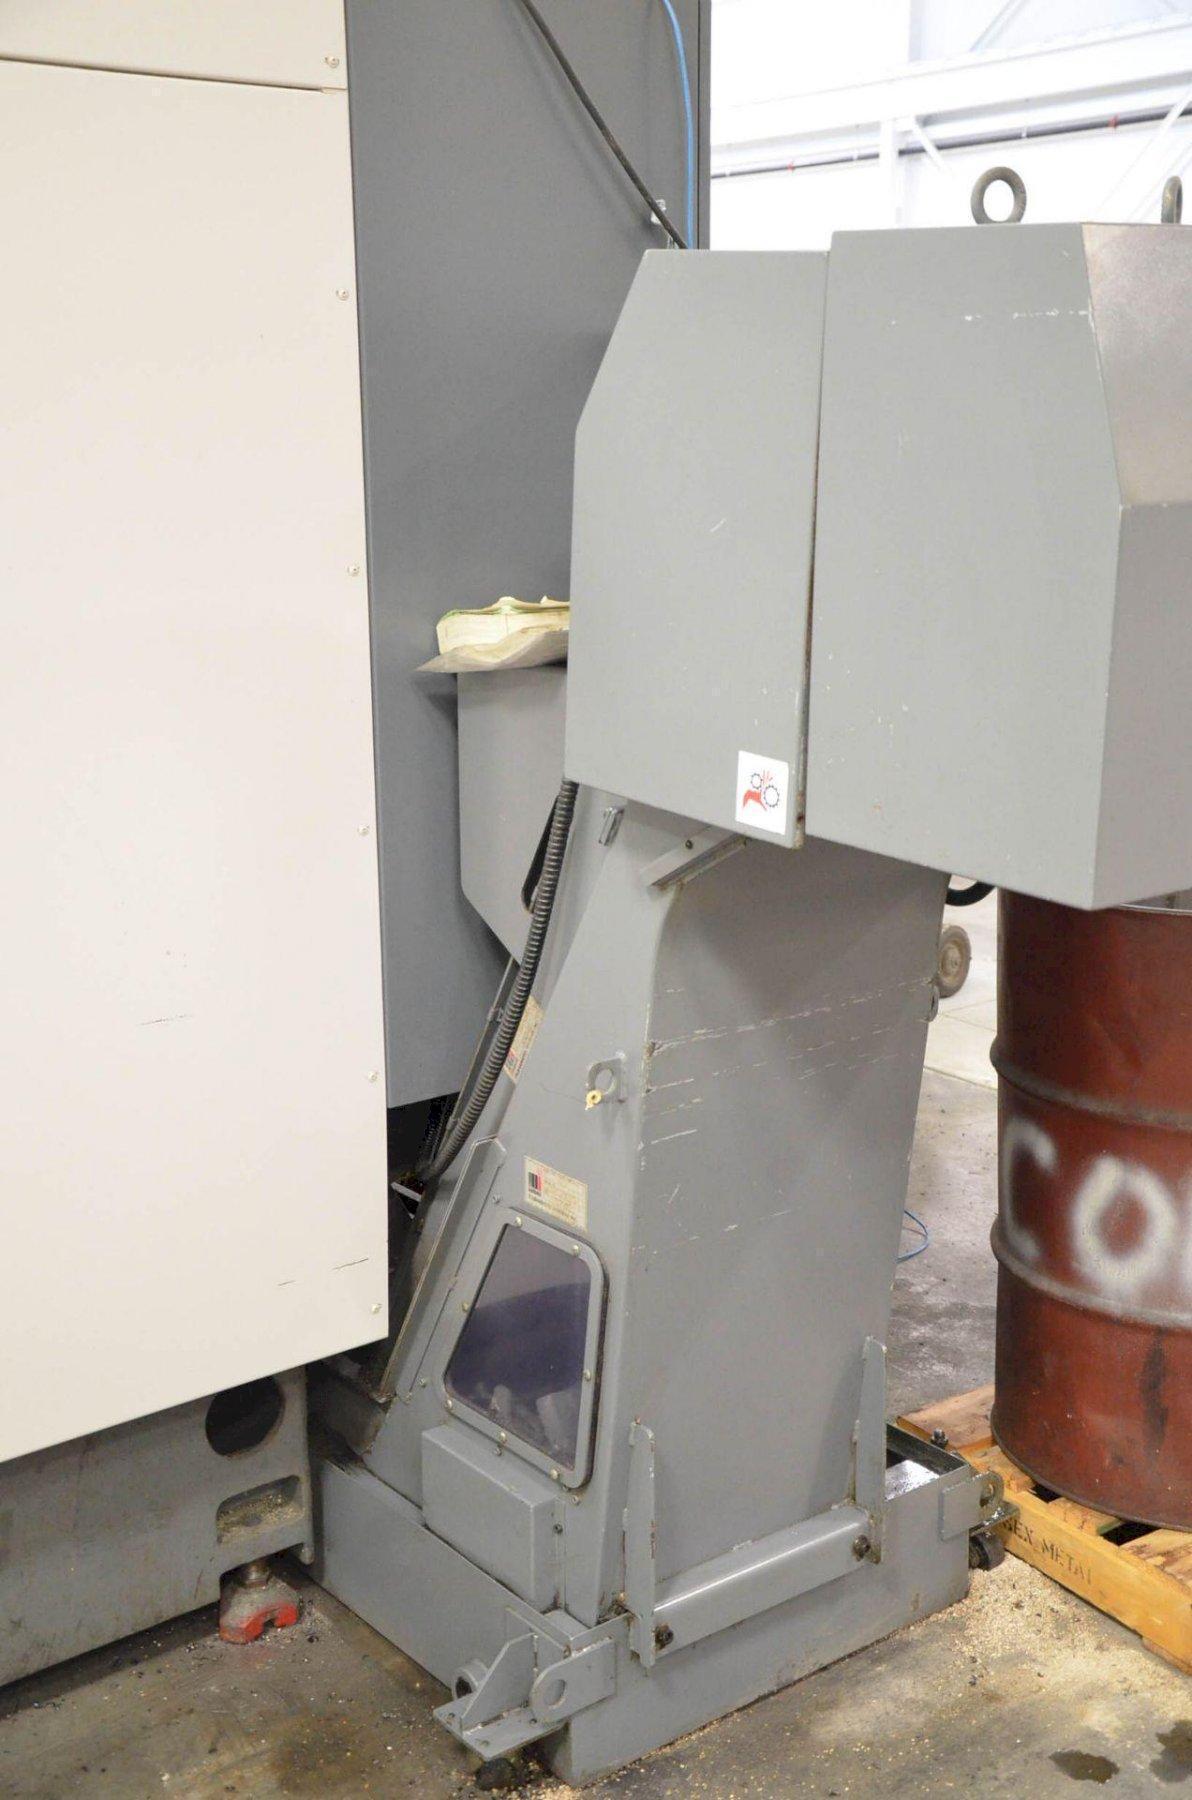 "Okuma MB65VB CNC Vertical Machining Center, OSP P200M, 41""/22""/18"", 12K RPM, 50 Taper, 32 ATC, CTS, 30 HP, 2007"